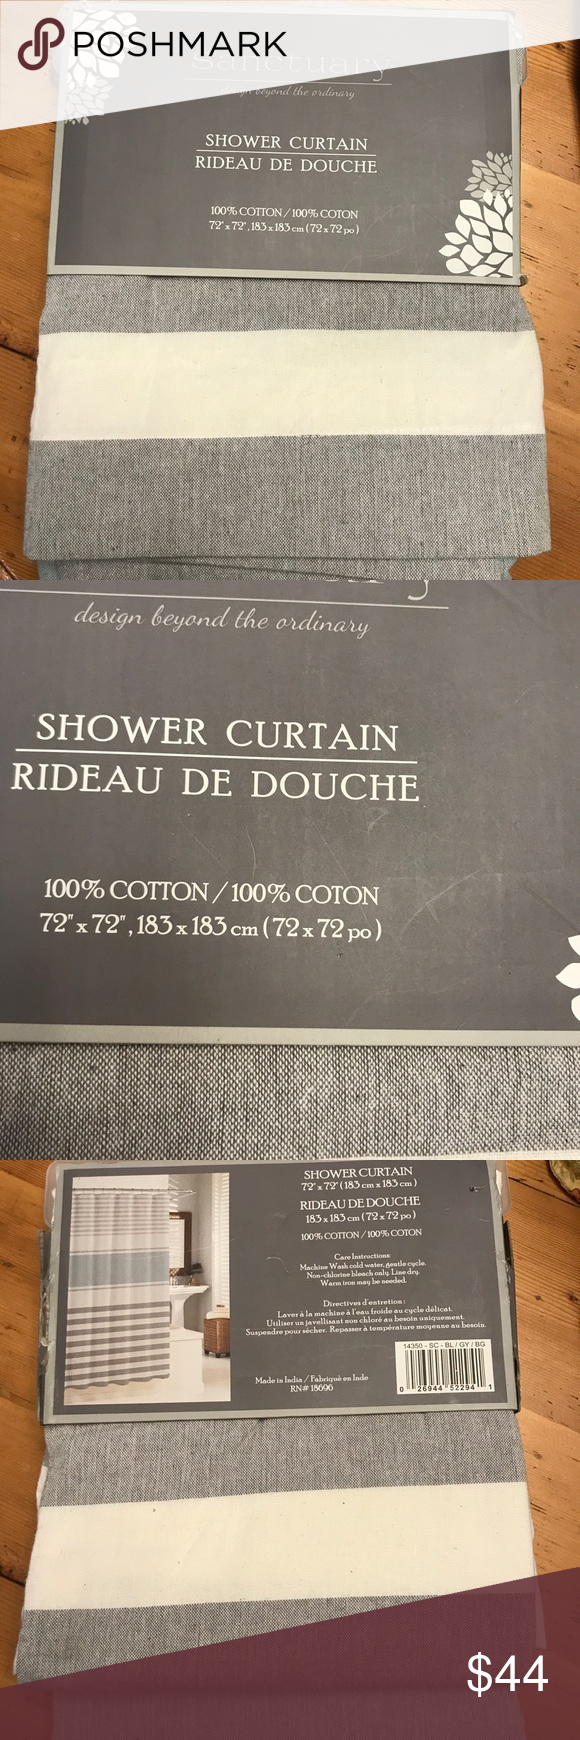 brand new sanctuary shower curtain